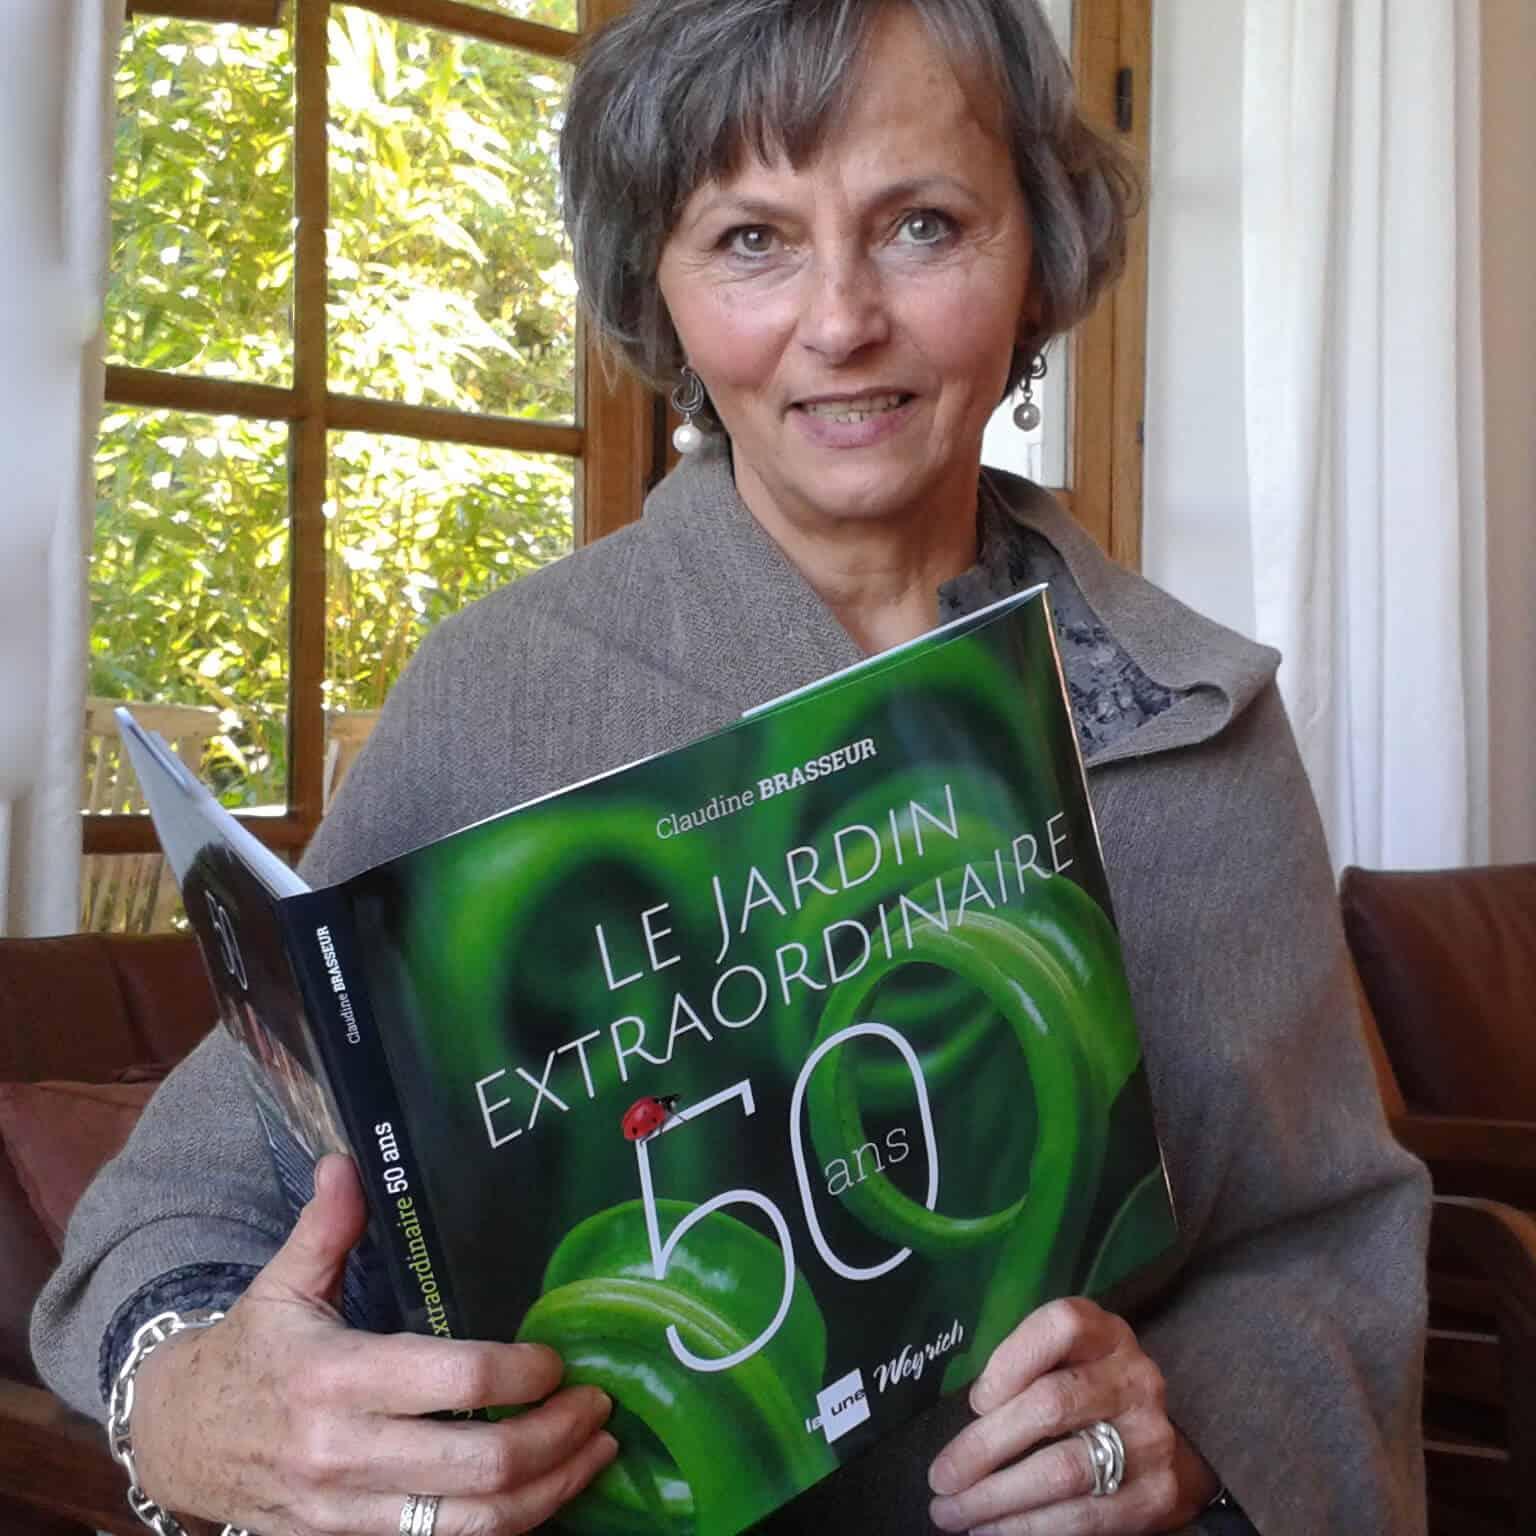 Le Jardin Extraordinaire, 50 ans – Claudine Brasseur